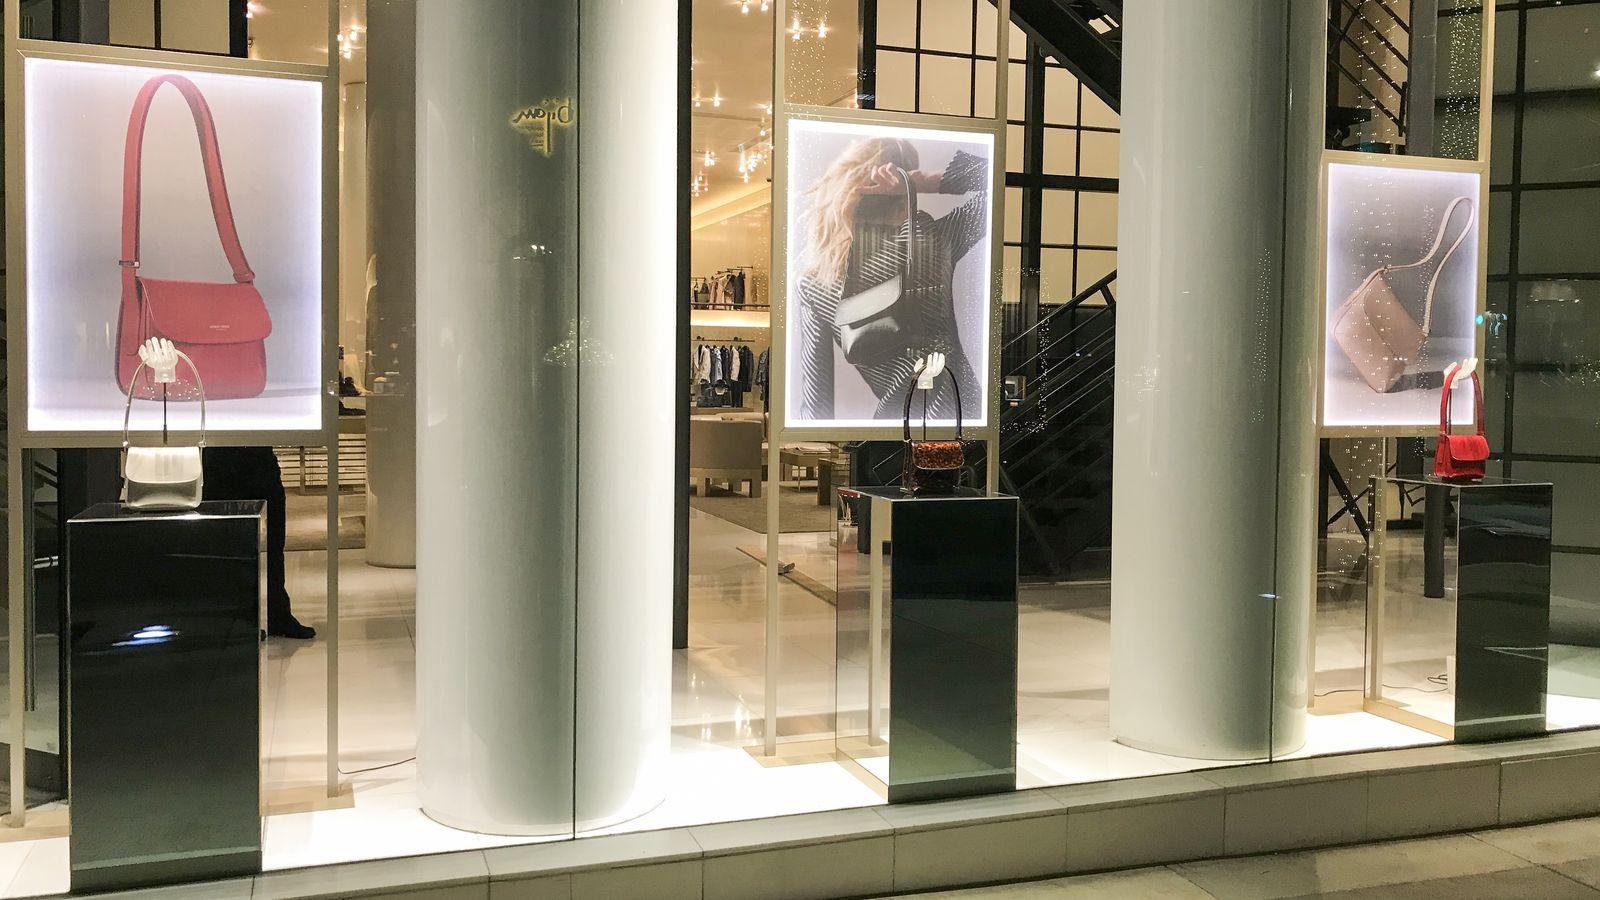 Giorgio Armani Storefront displays